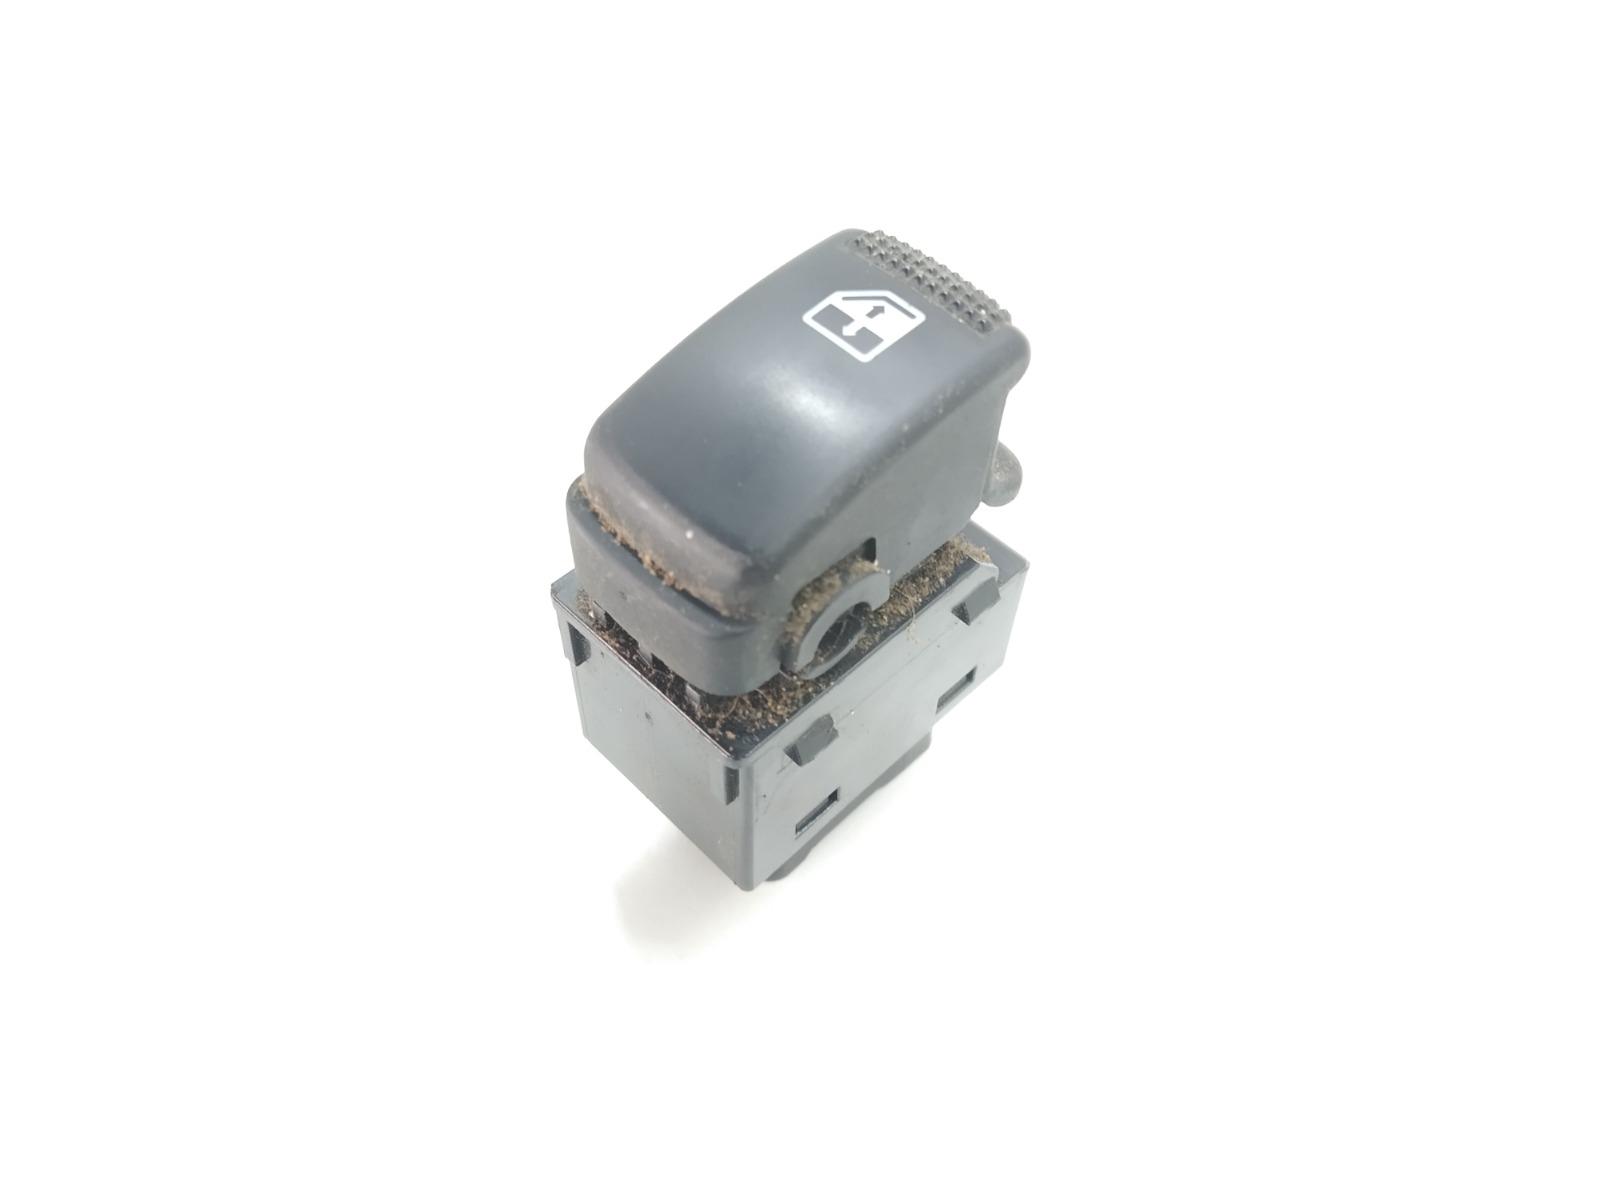 Кнопка стеклоподъемника Hyundai Tucson 2.0 CRDI 2005 (б/у)